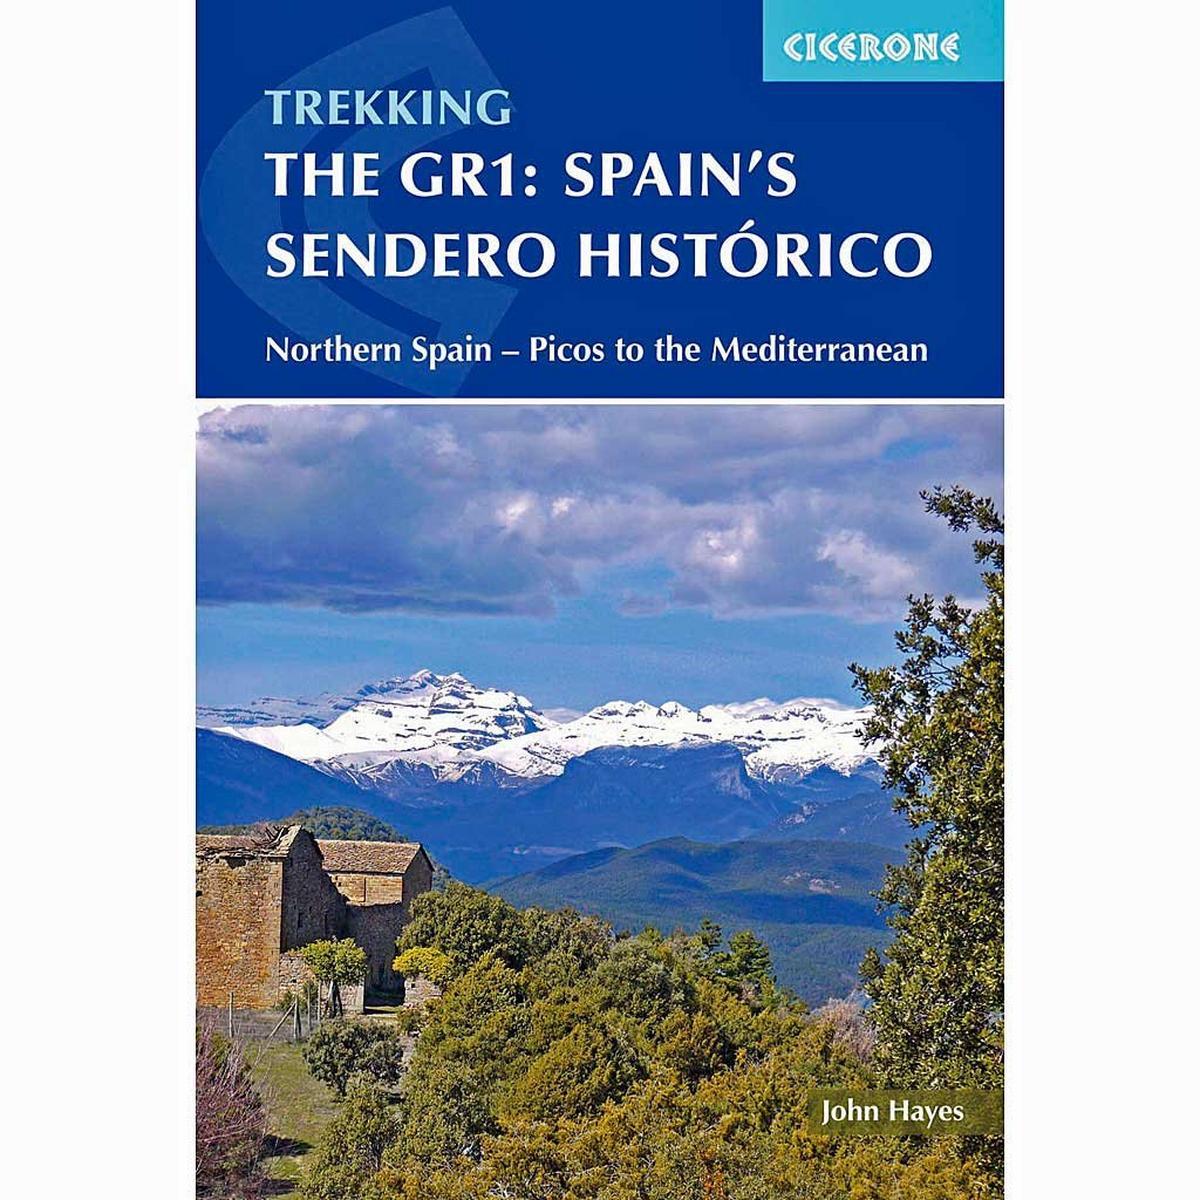 Cicerone Guide Book: Trekking the GR1 Spain's Sendero Historico: Hayes